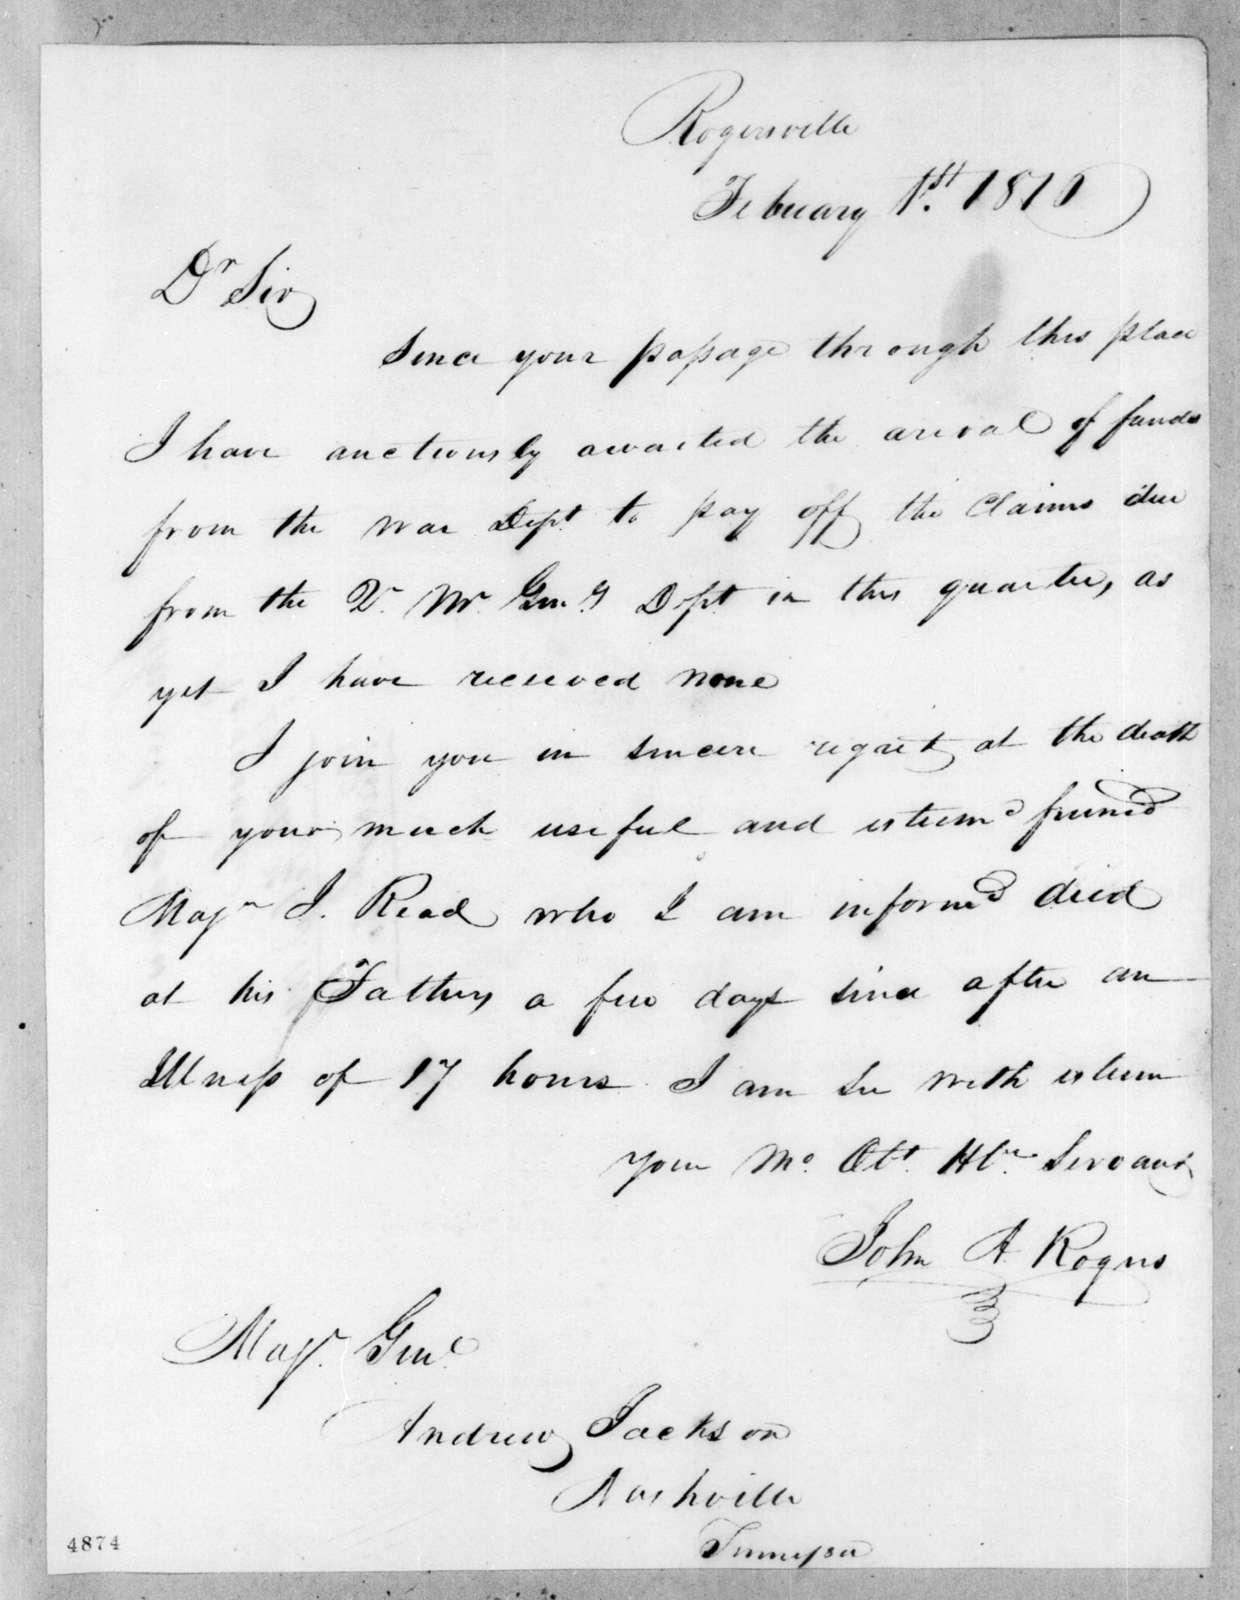 John A. Rogers to Andrew Jackson, February 1, 1816